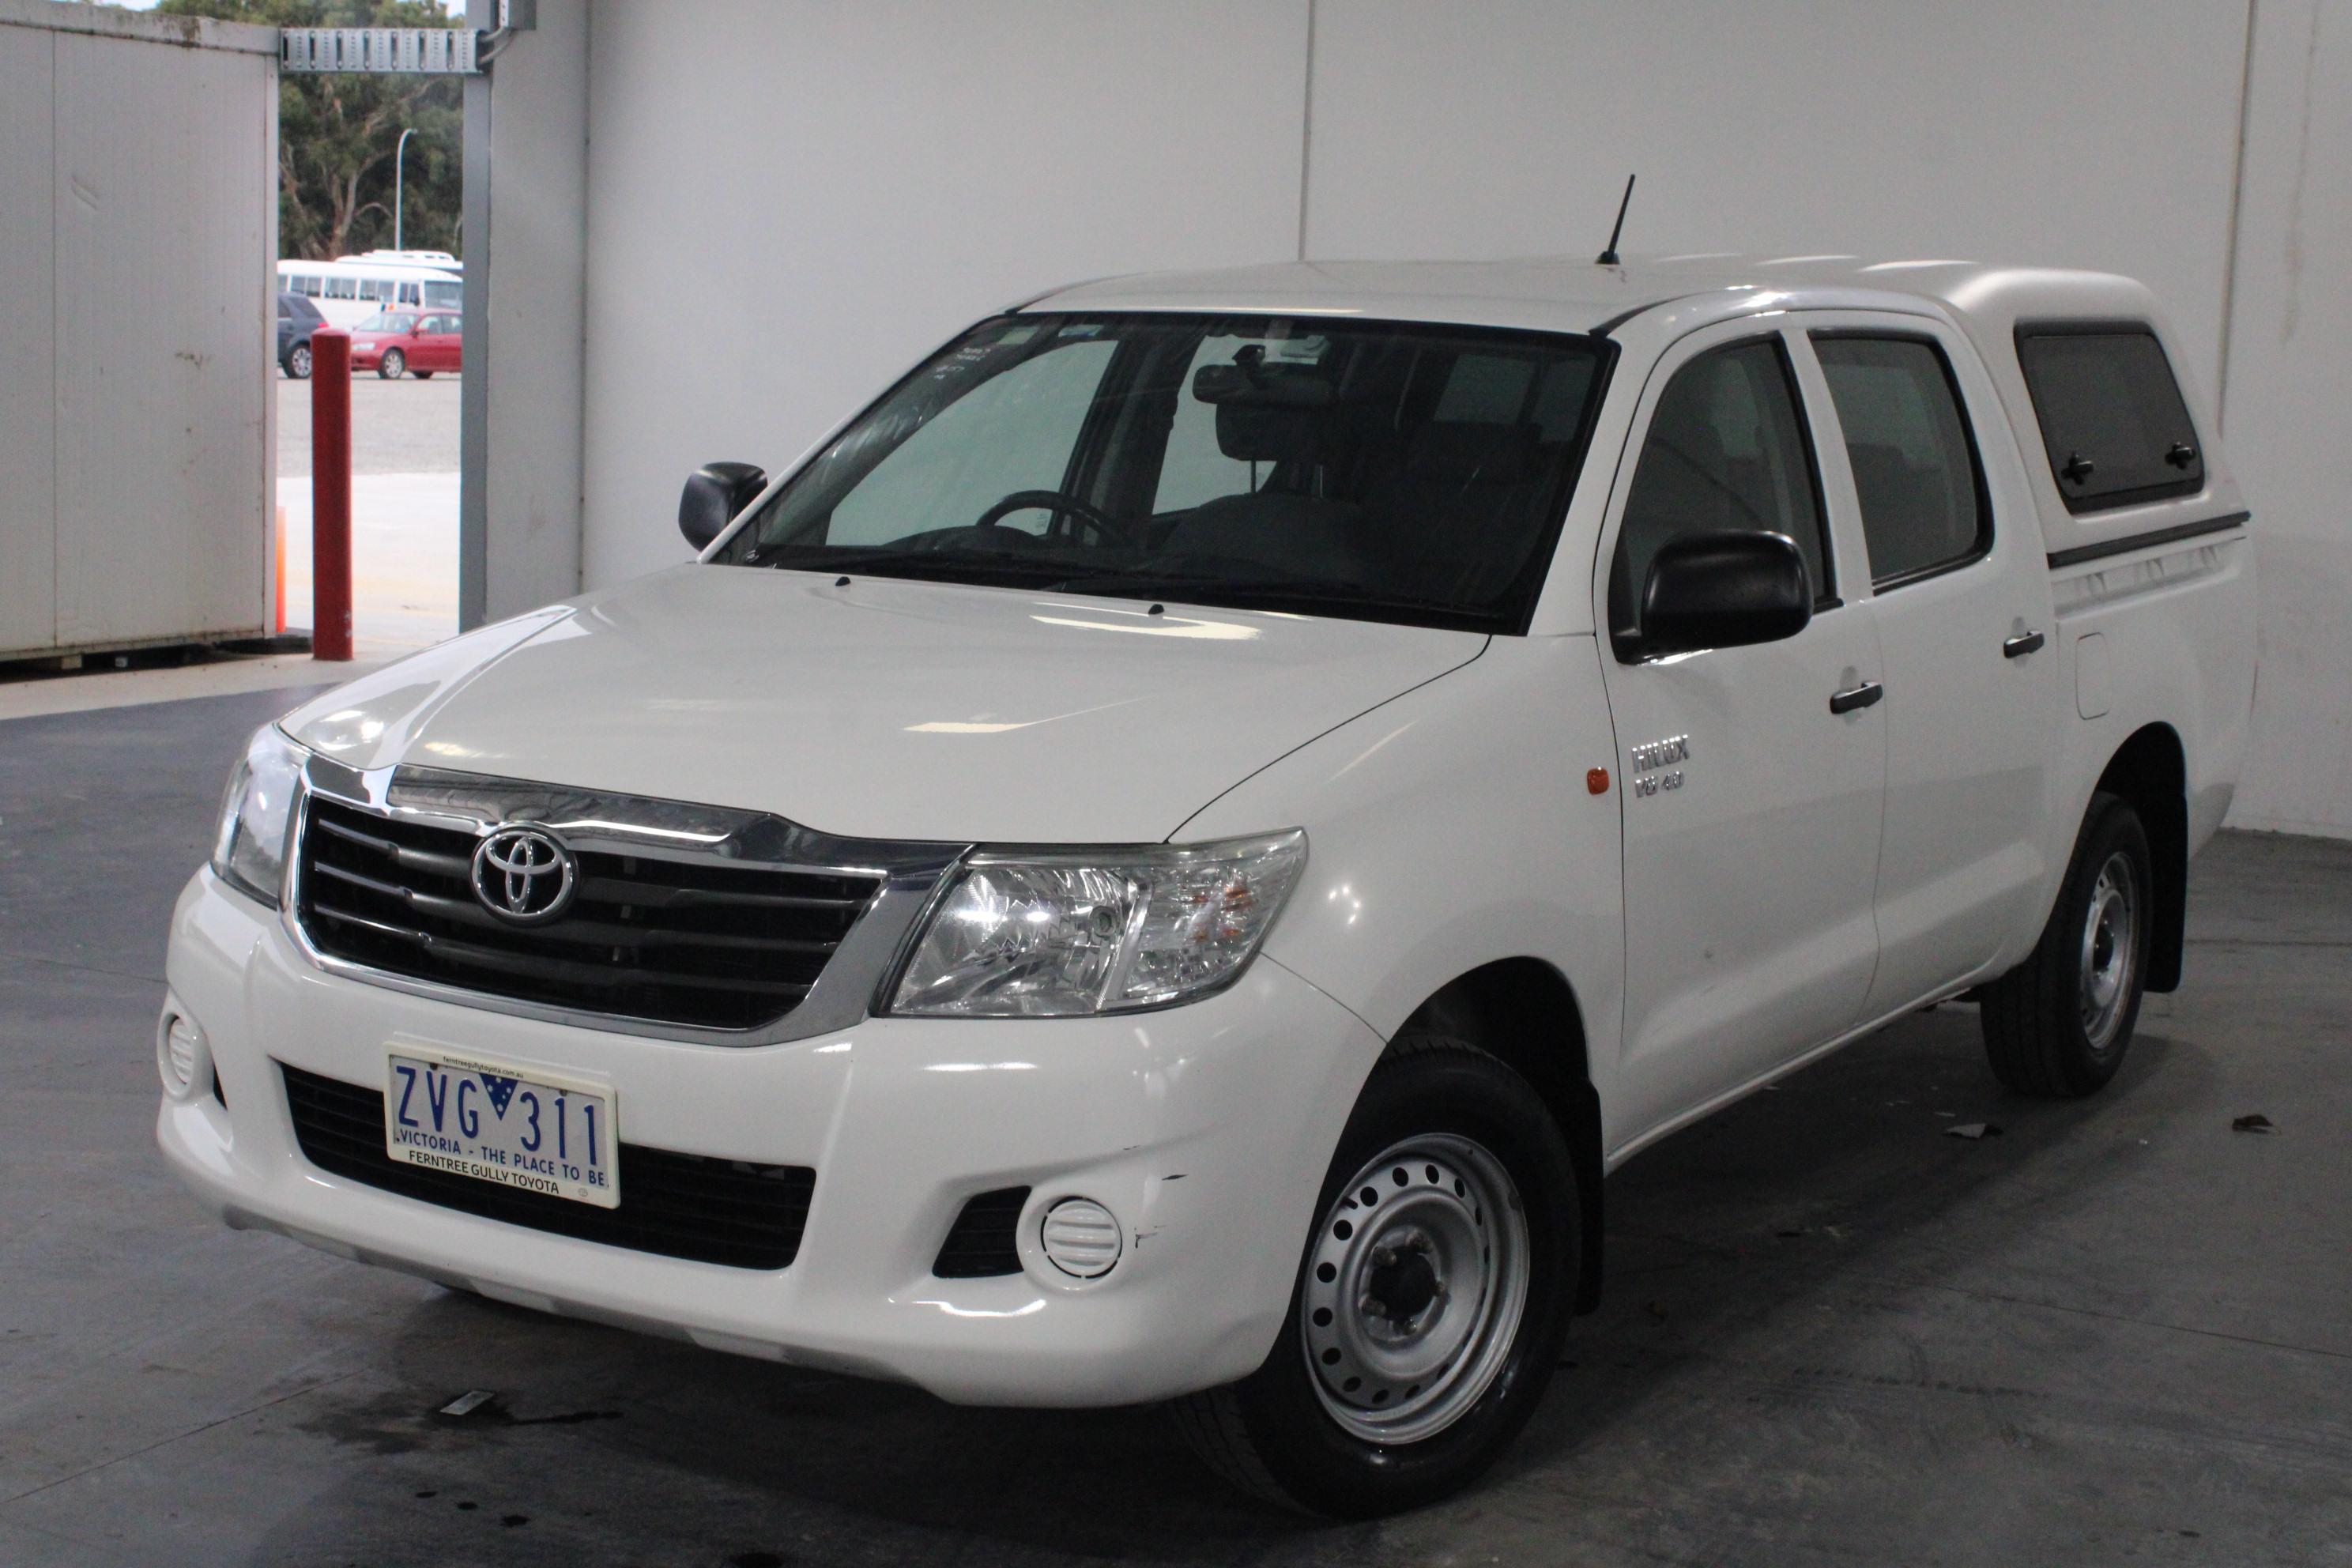 2013 Toyota Hilux SR GGN15R Automatic Dual Cab (Ex-Gov)